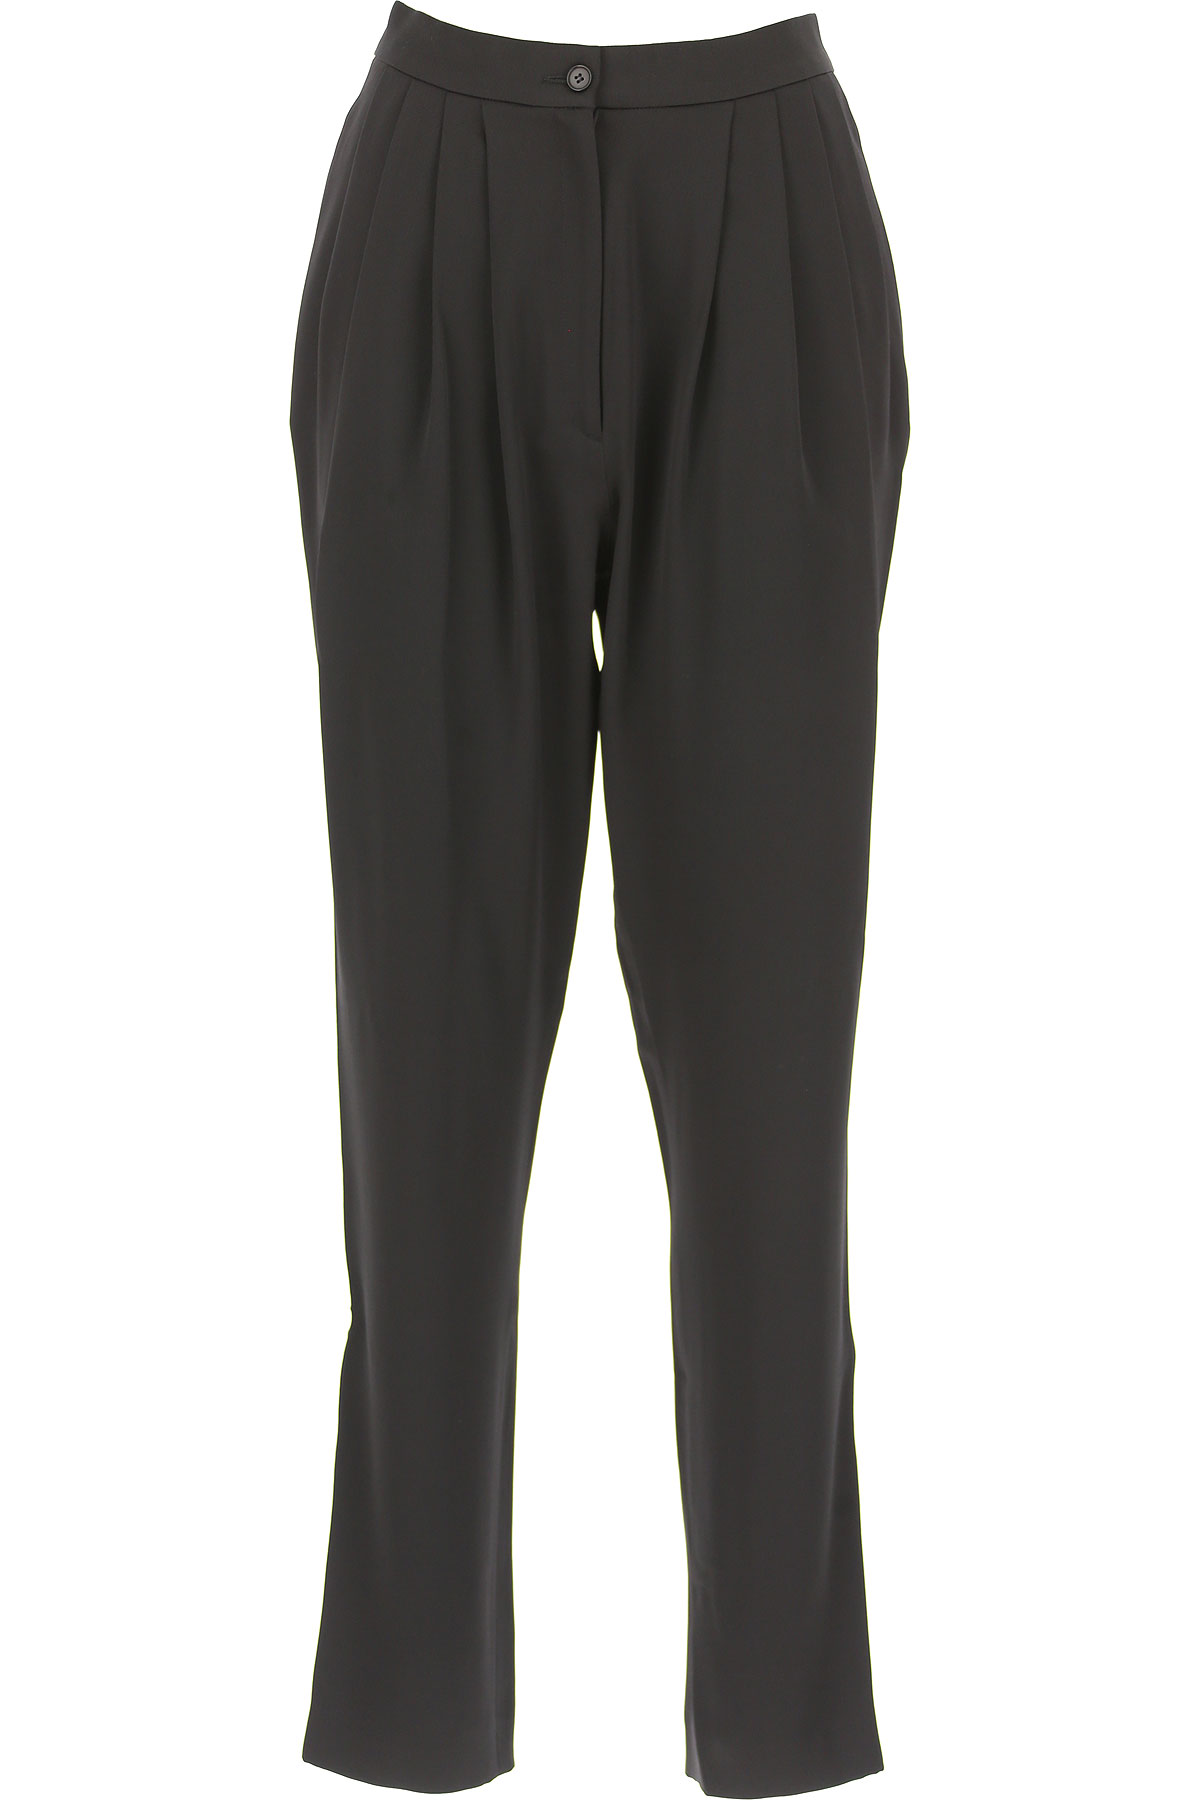 Image of Alberta Ferretti Pants for Women, Black, acetate, 2017, 26 28